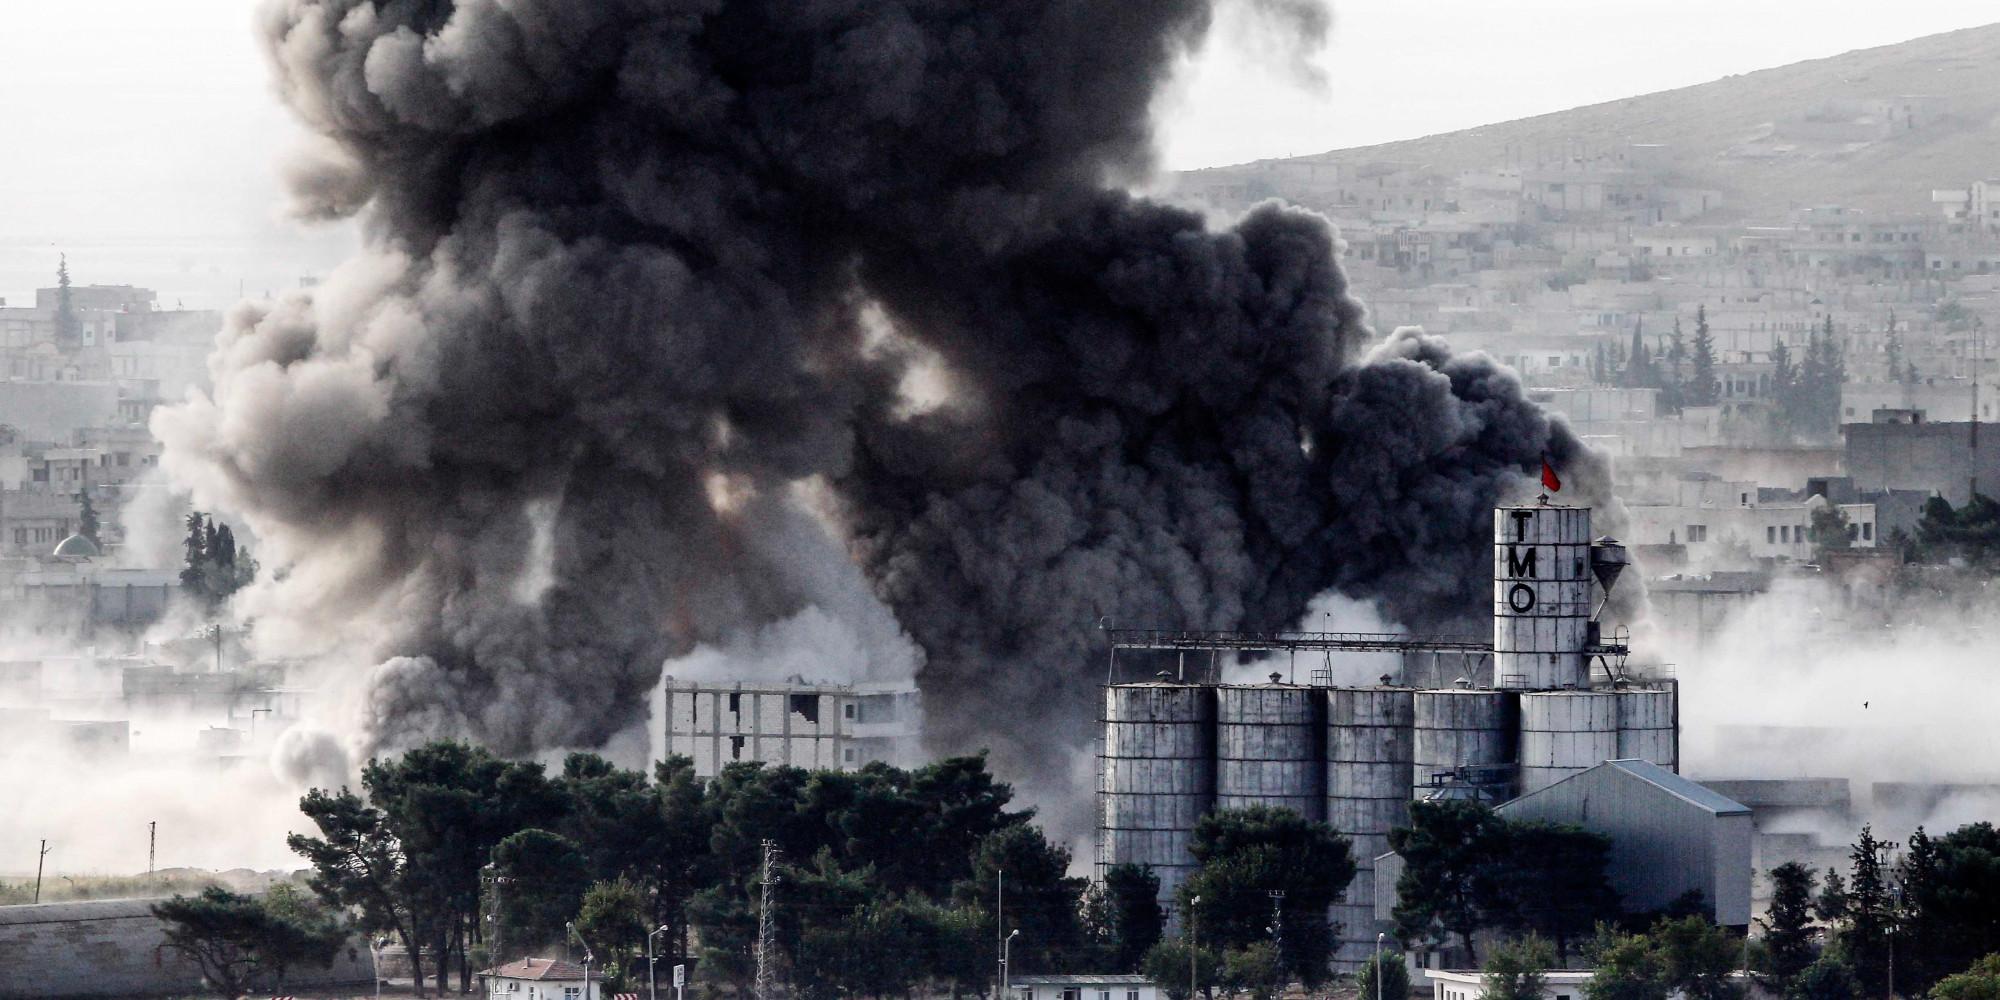 essay on islamic extremism